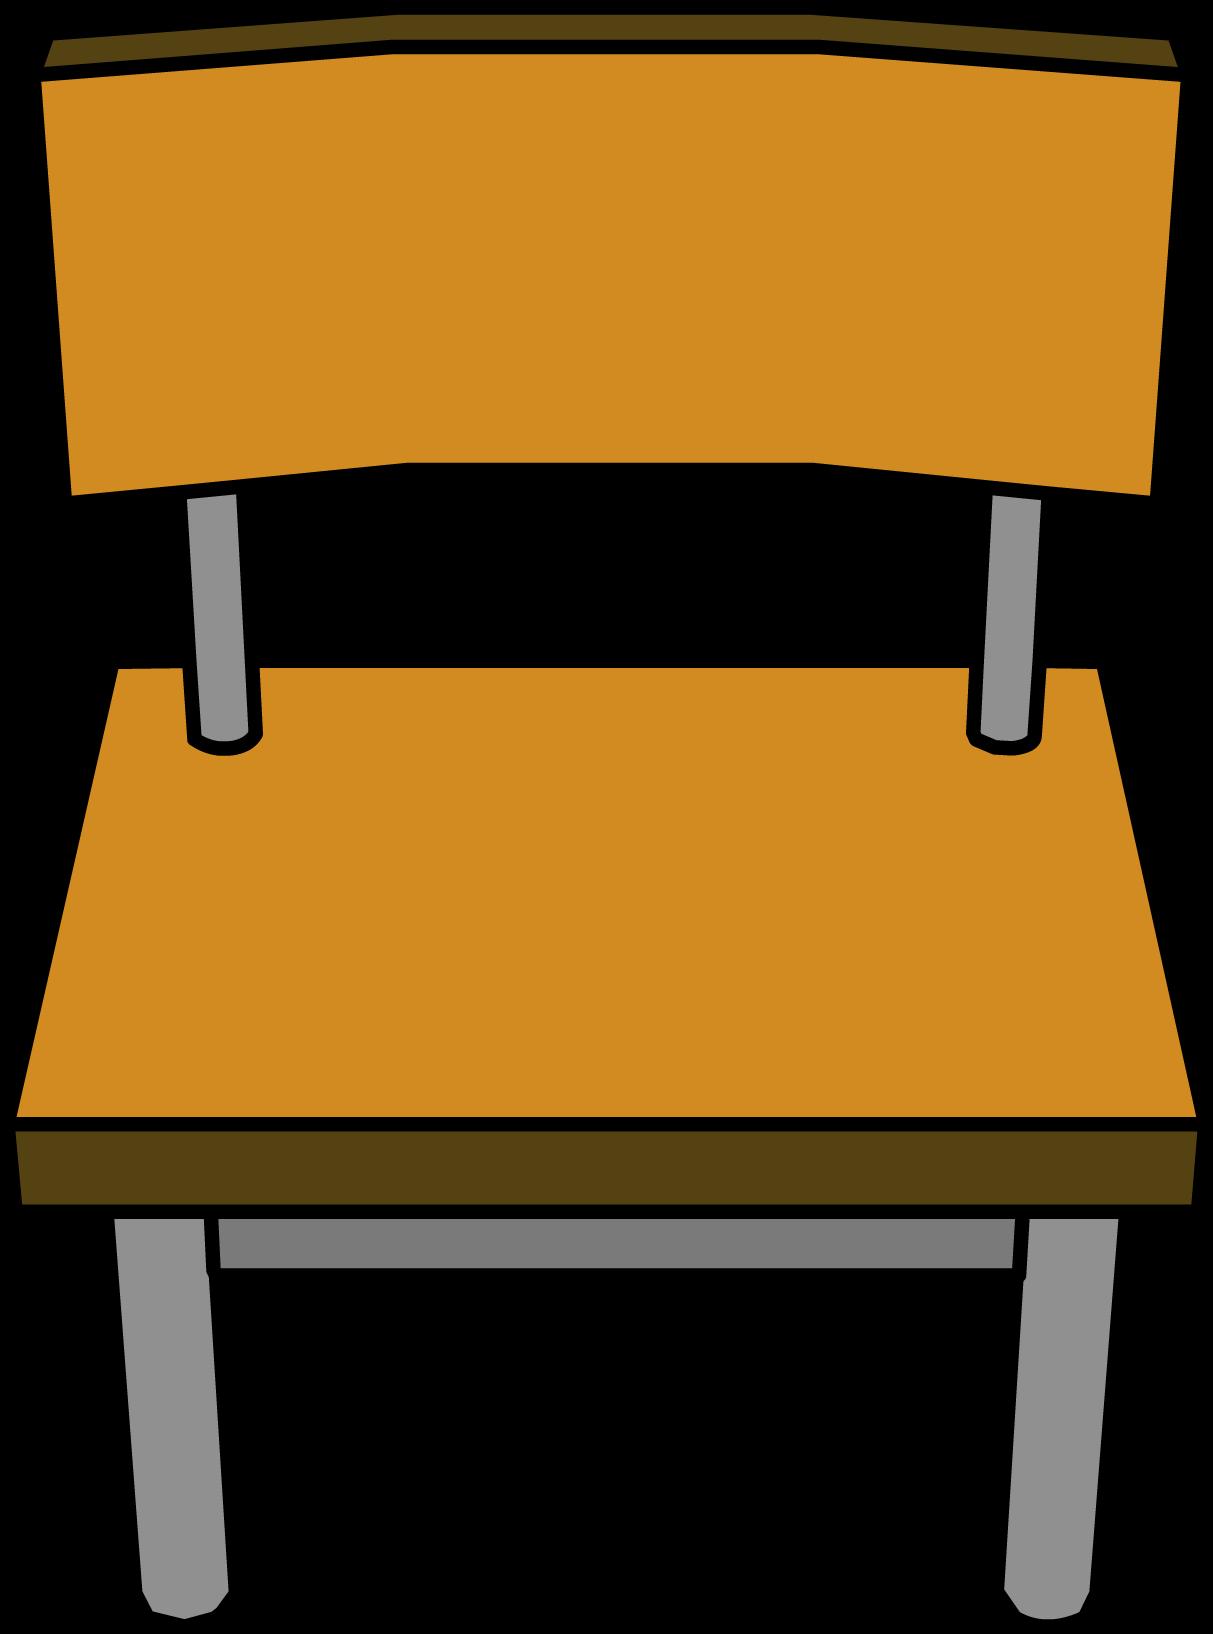 School Table Clipart Free Download Best School Table